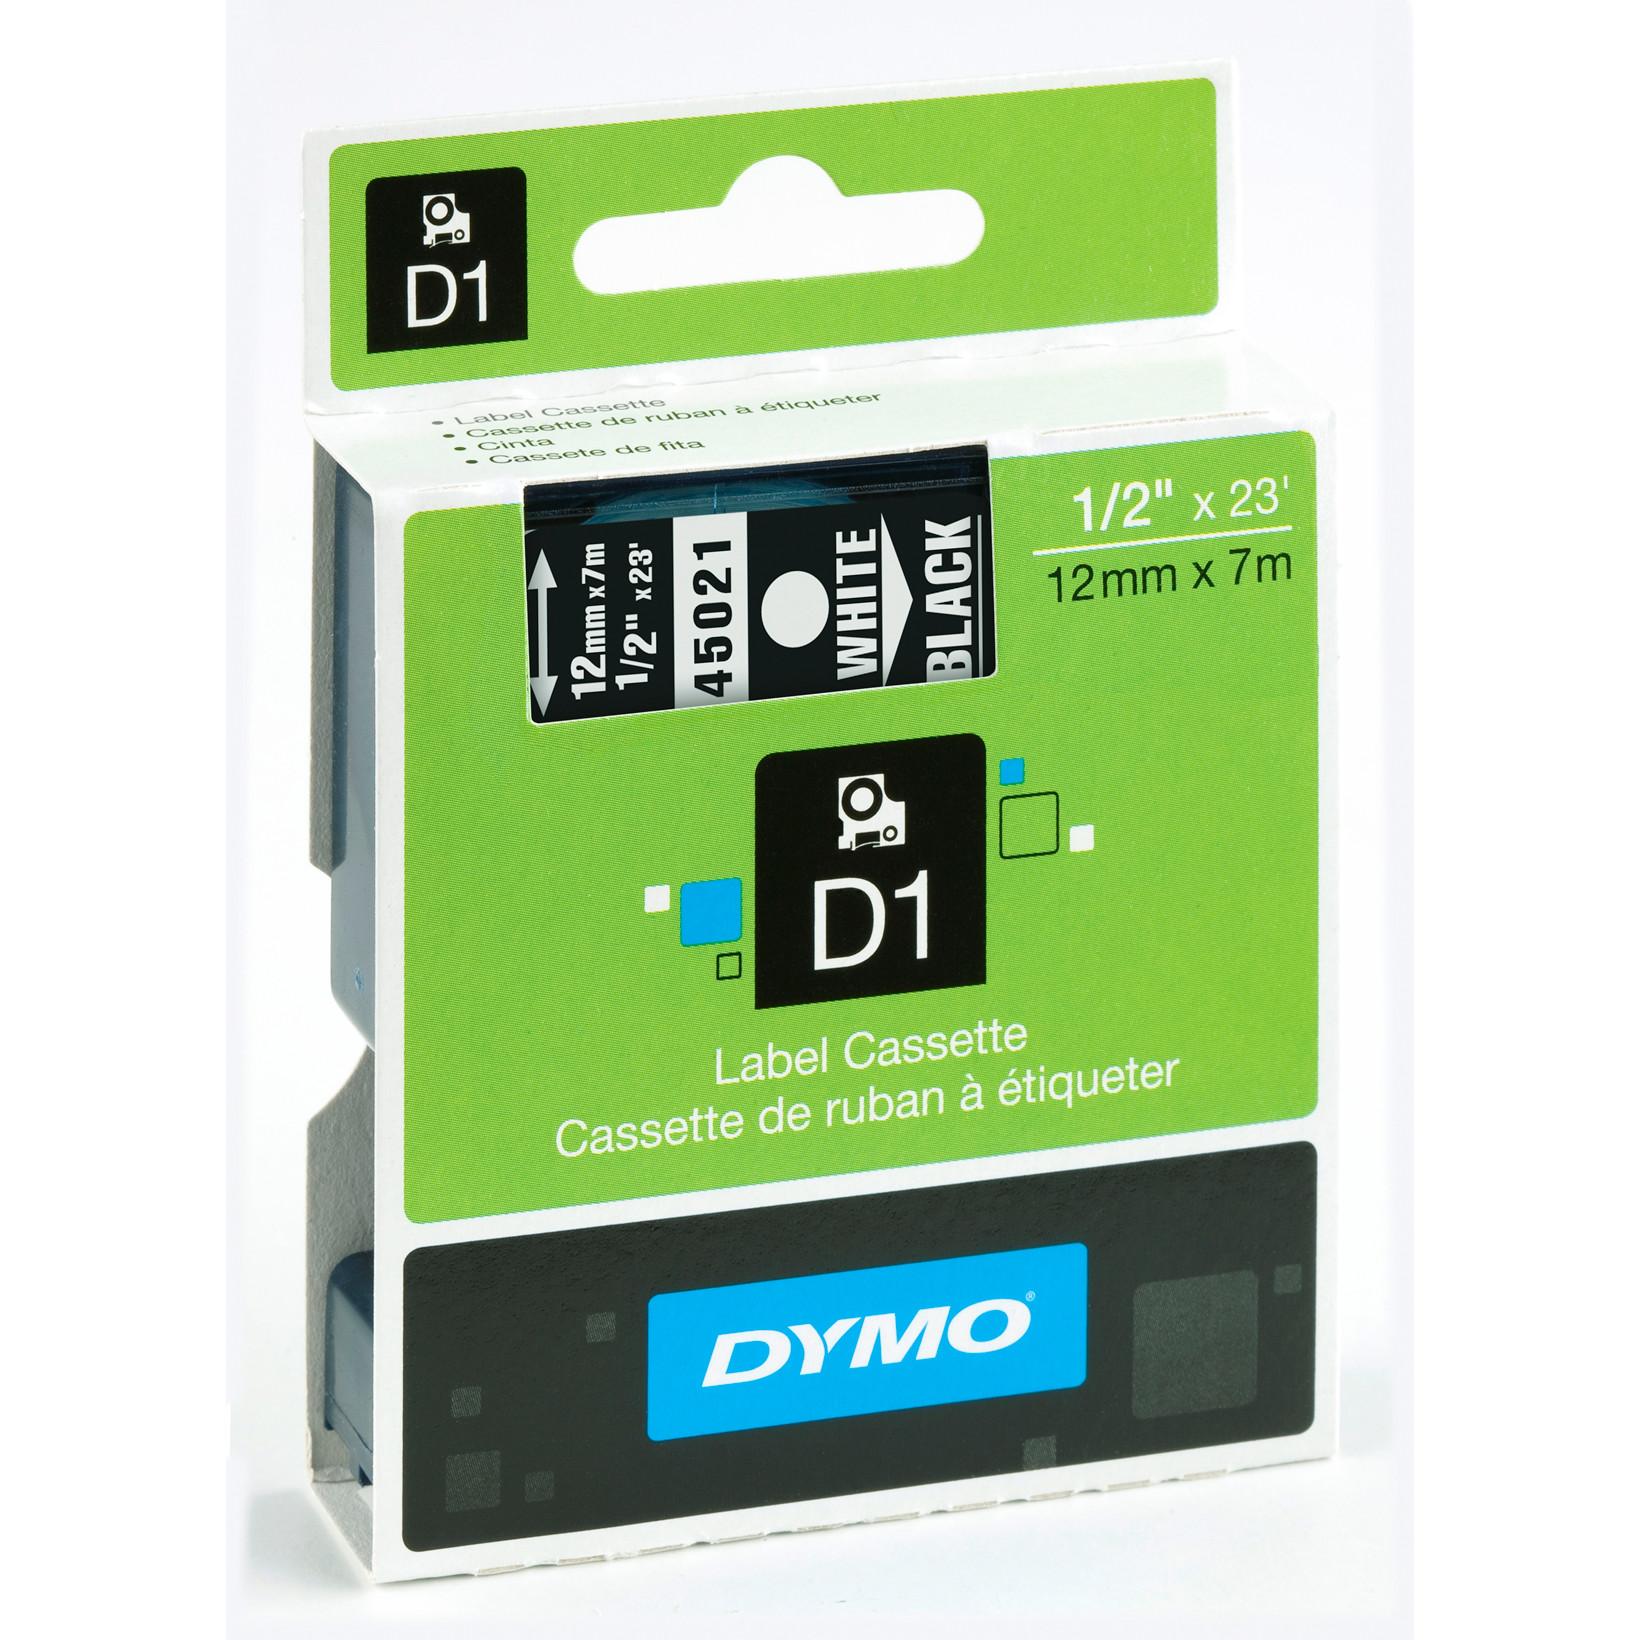 DYMO D1 45021 - Etiket tape 12 mm hvid på sort